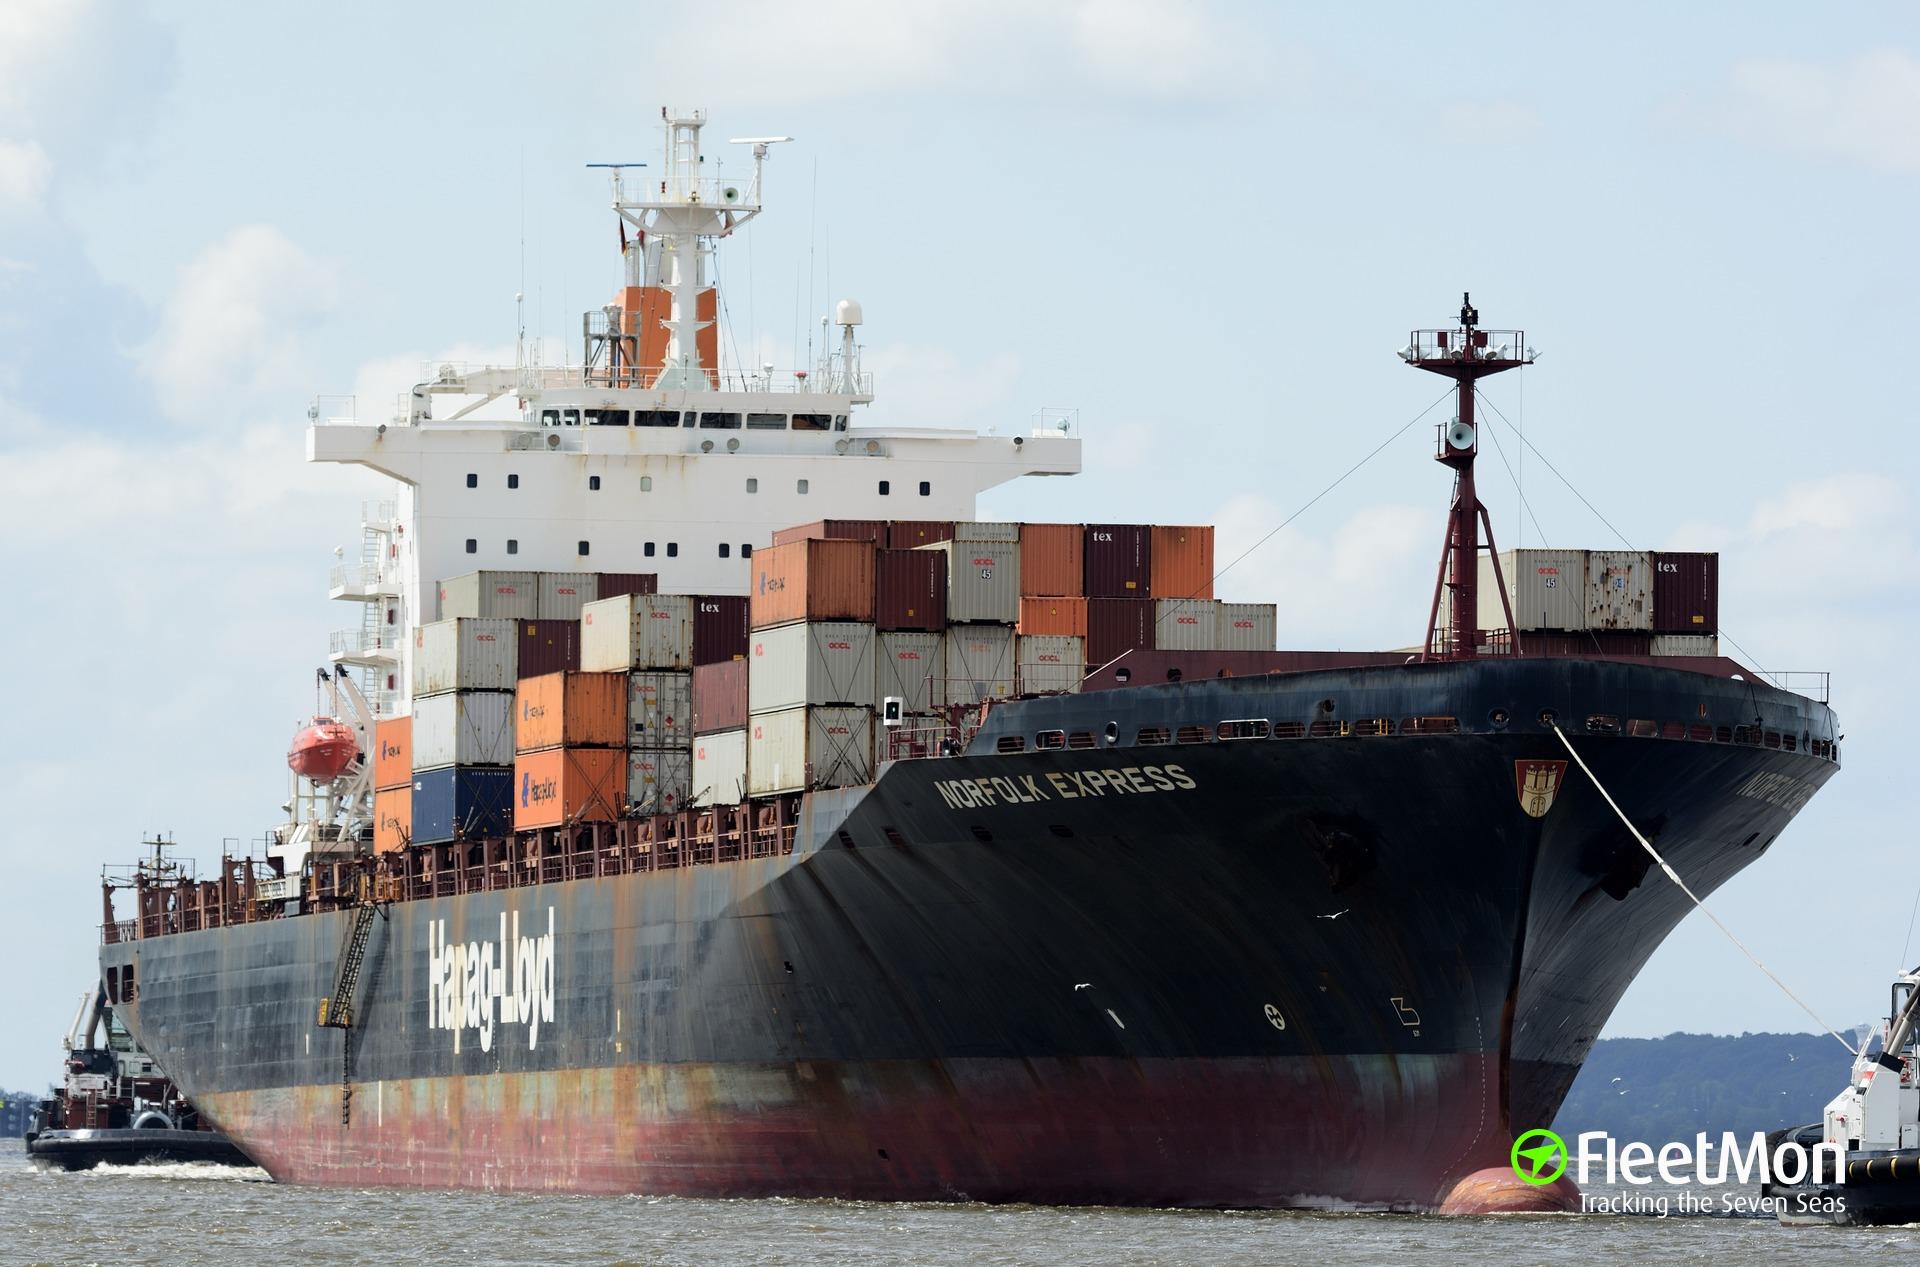 Boxship Norfolk Express aground and refloated, Weser